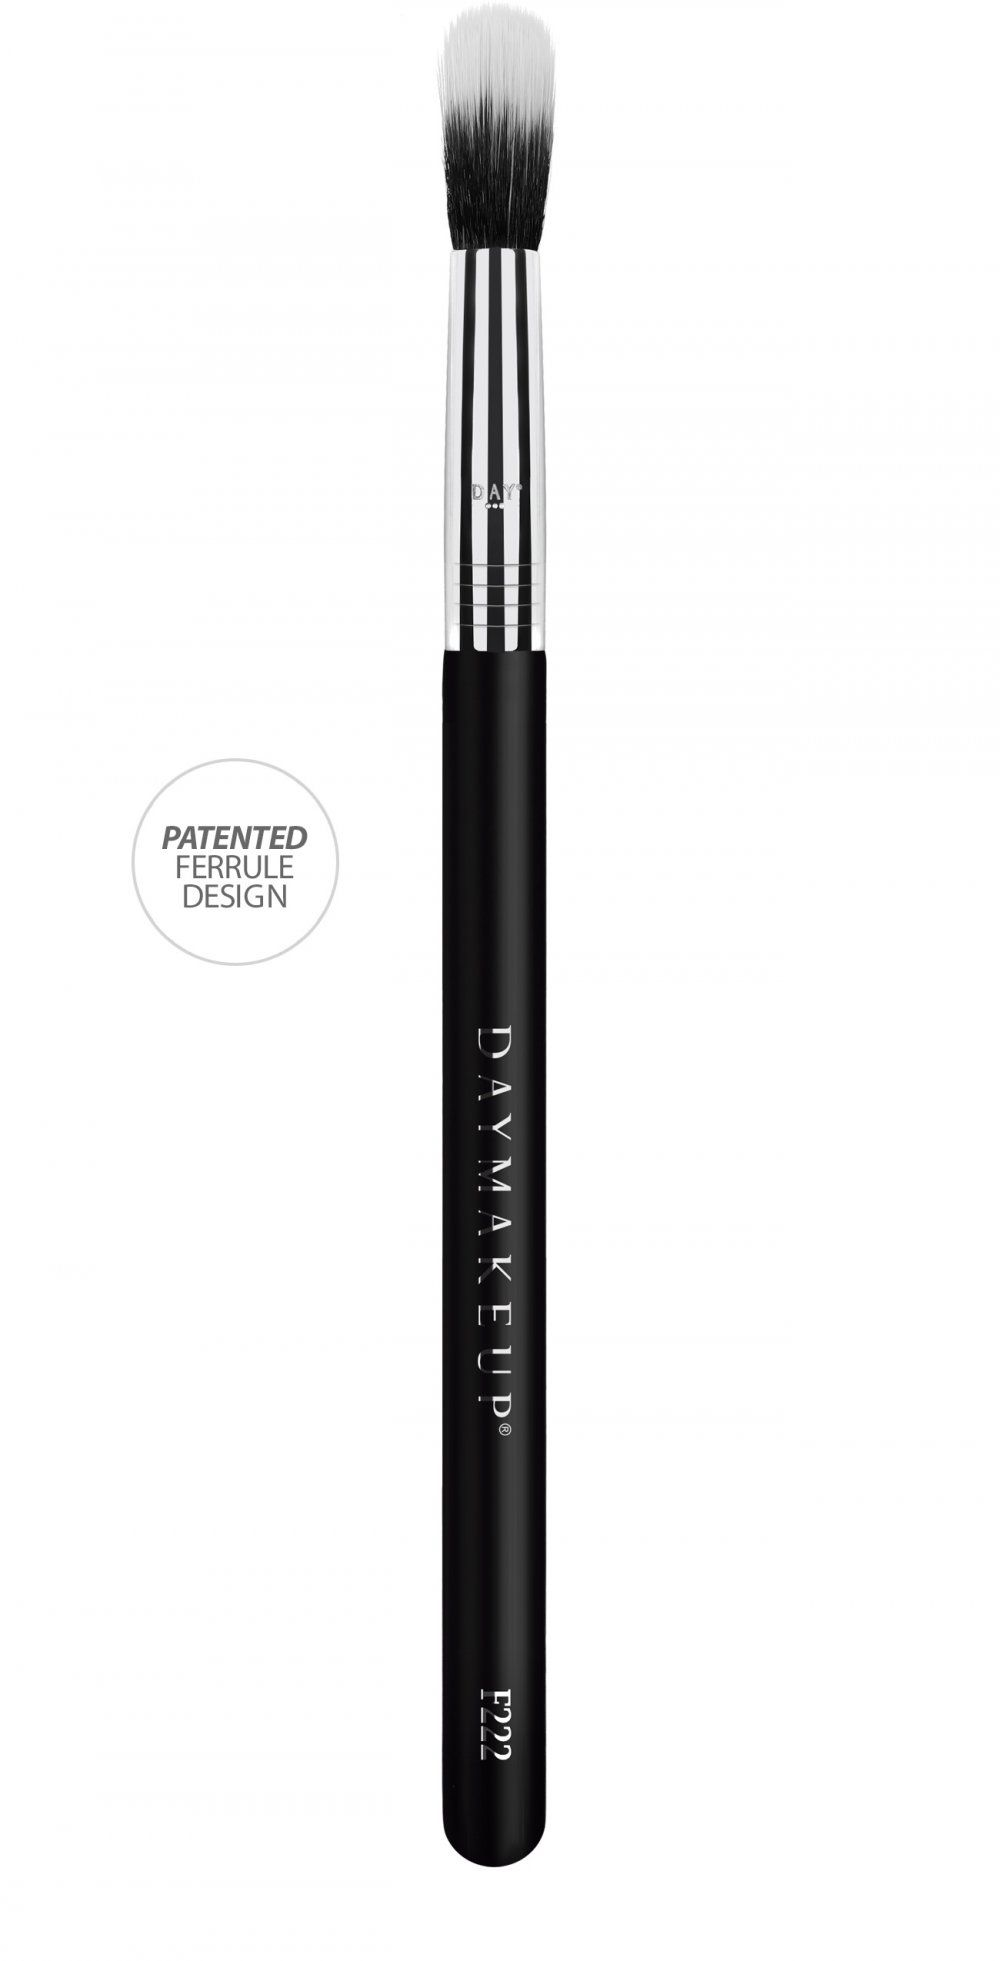 Pincel Duo Fiber Para Iluminação F222 - Daymakeup